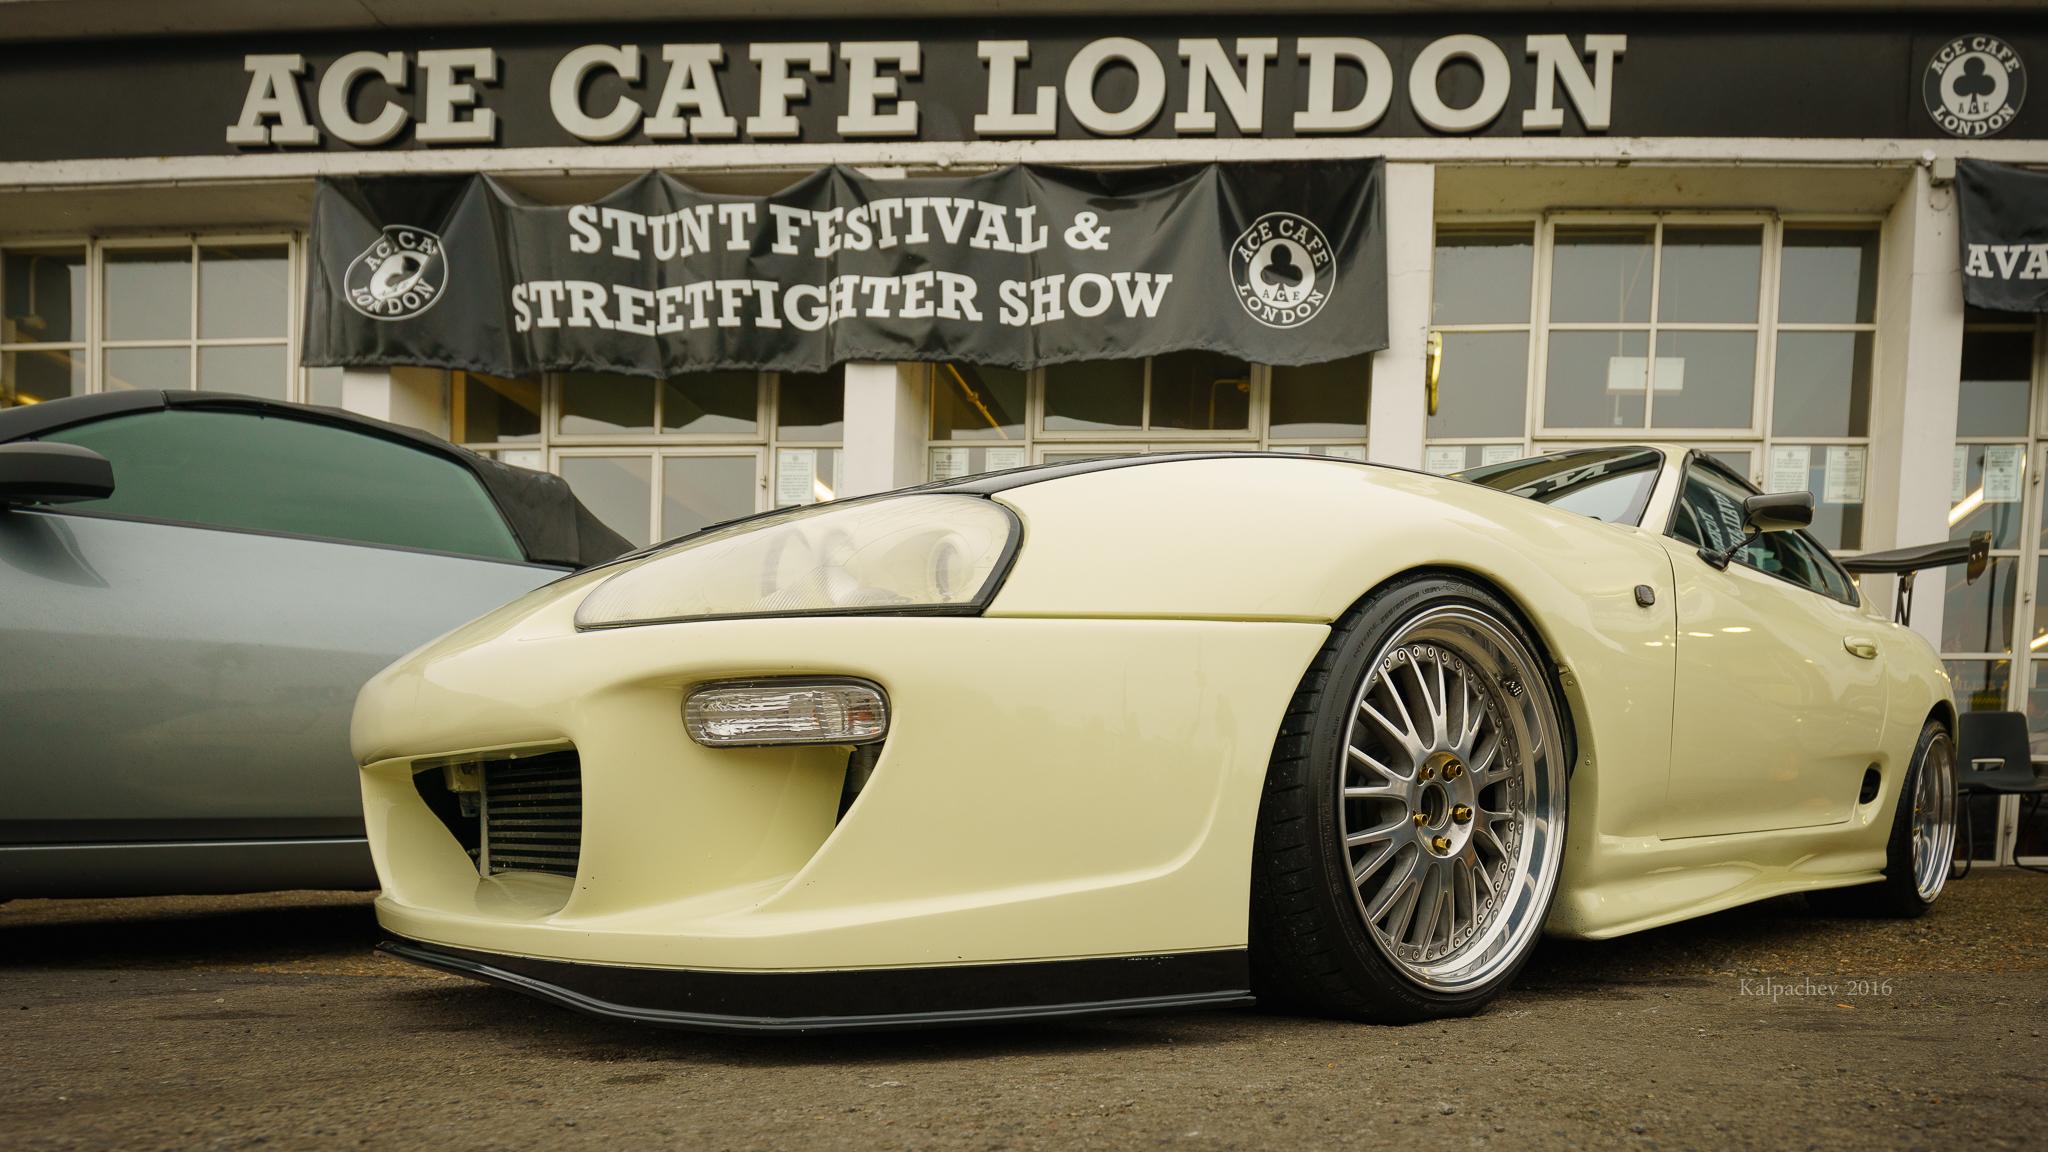 Ace cafe London @acecafelondon #acecafe #fastcars